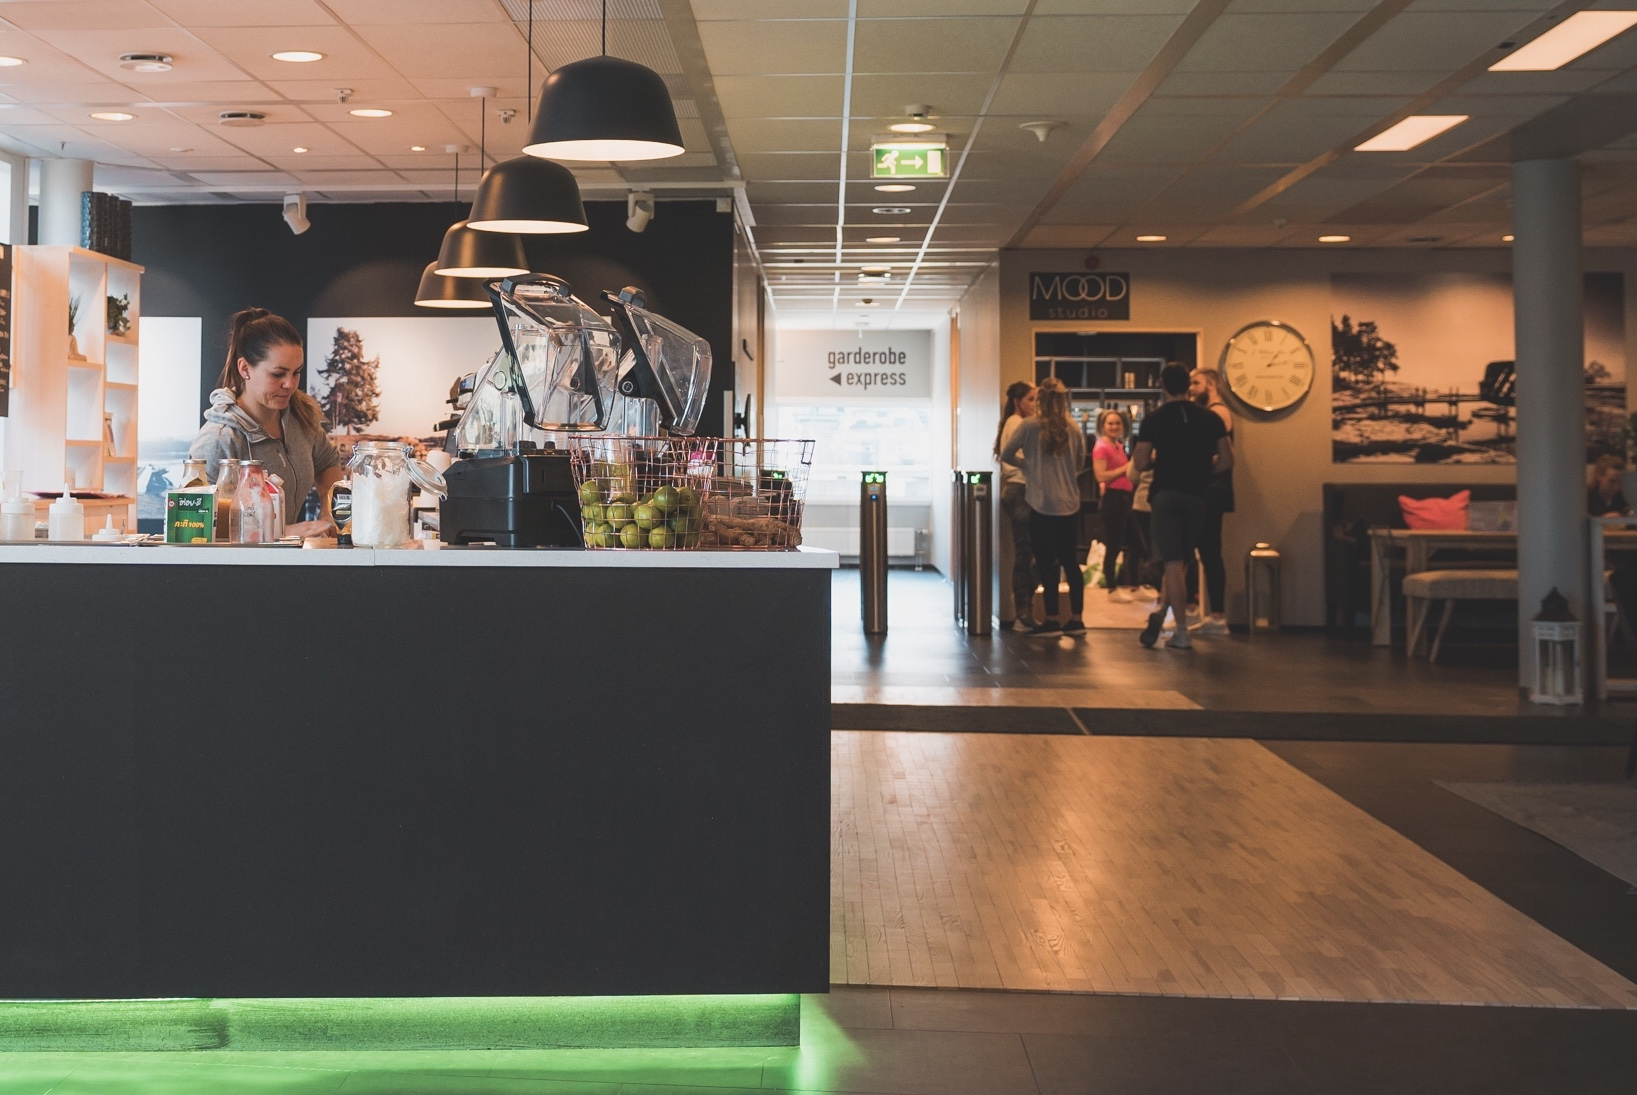 Felles inngang og lounge-område med Asker Treningsenter. Samt inngangen til Mood Studio Asker, mars 2017.